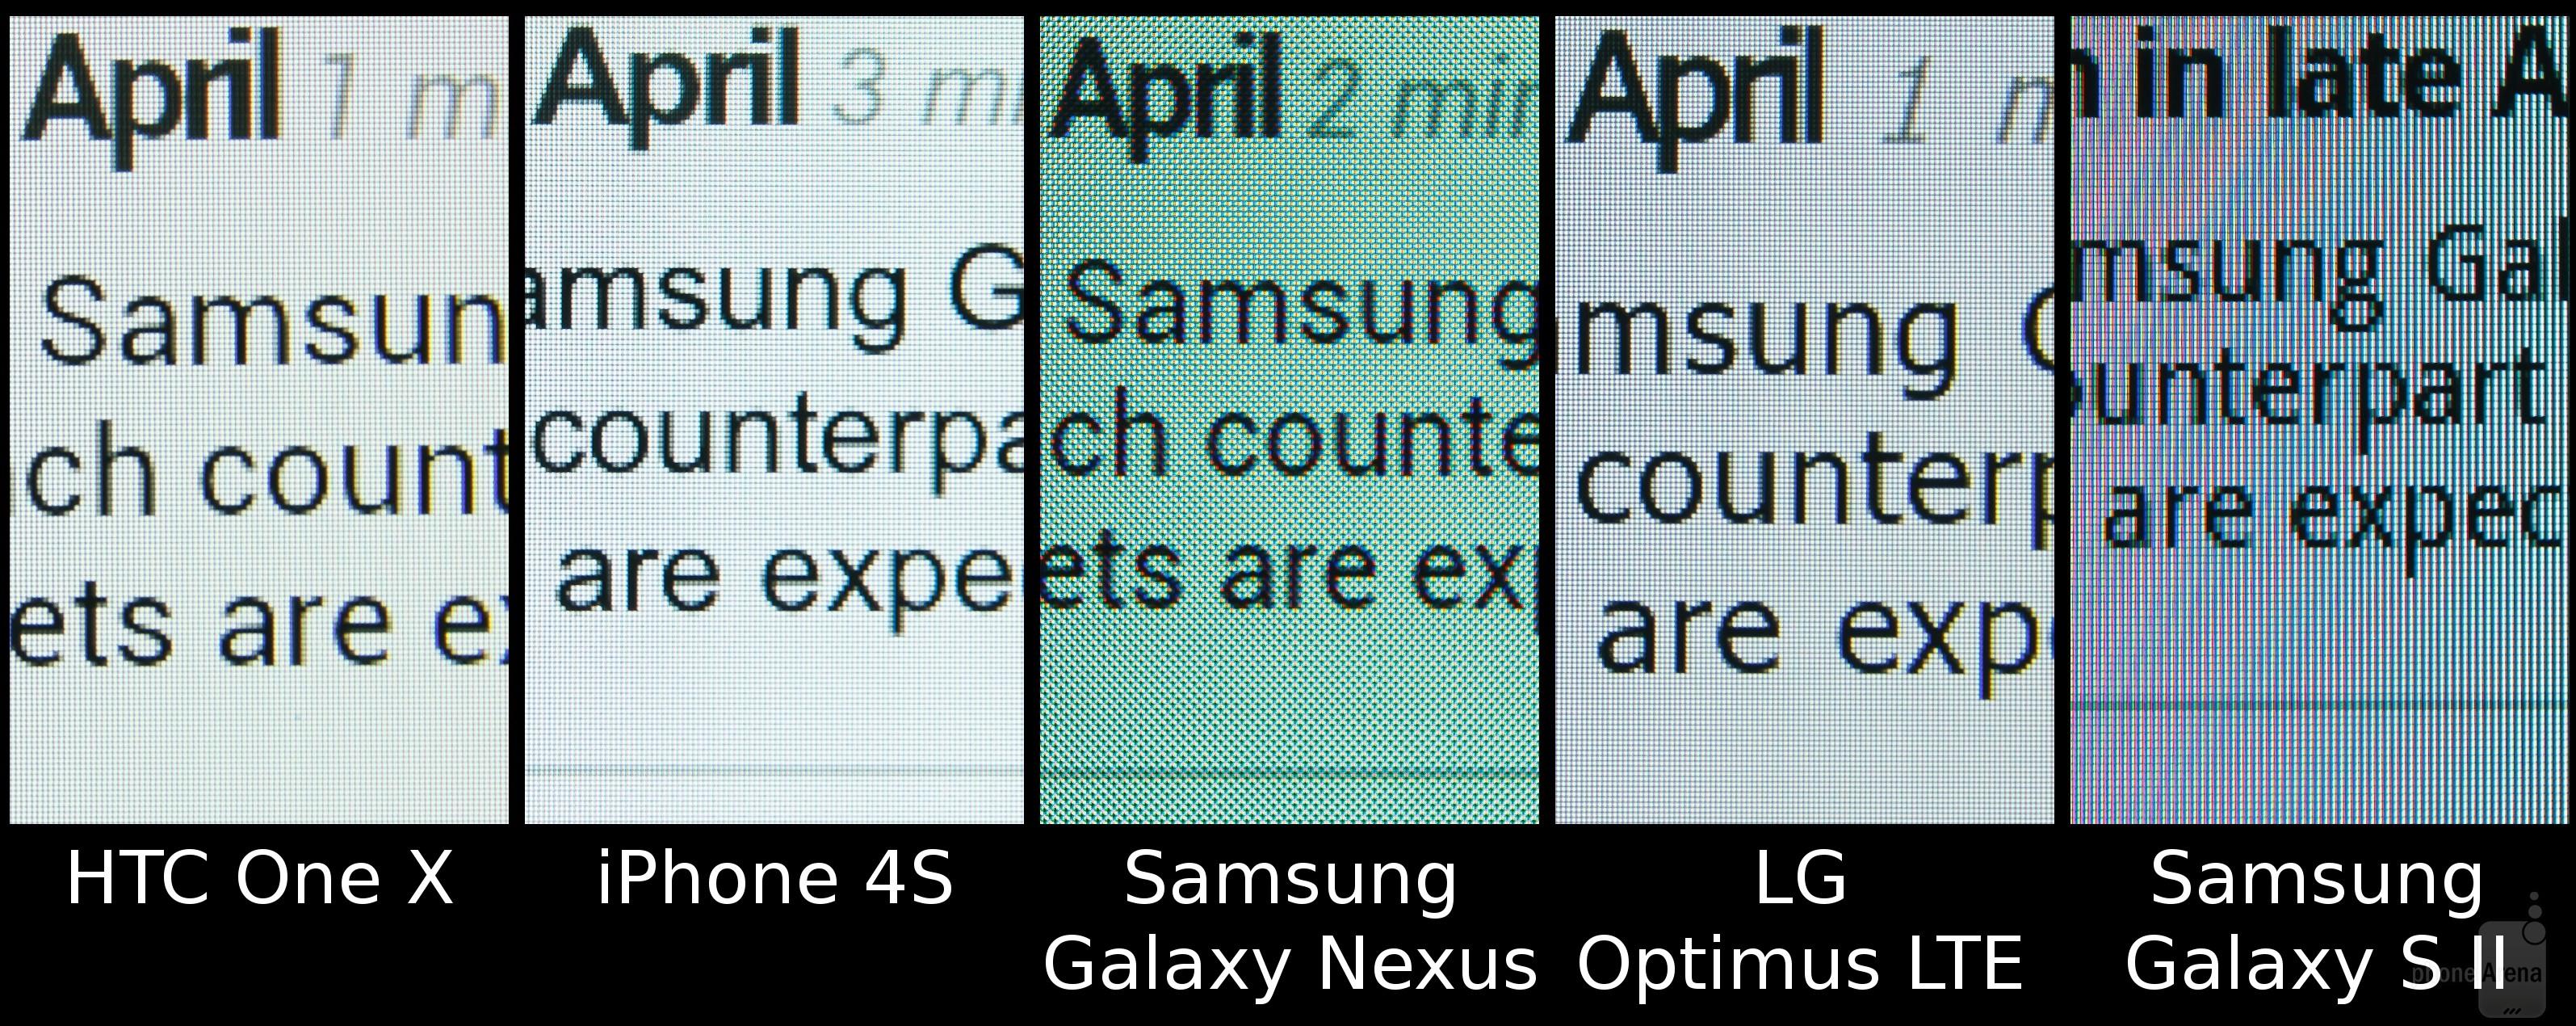 image-comparison-3-centered-text